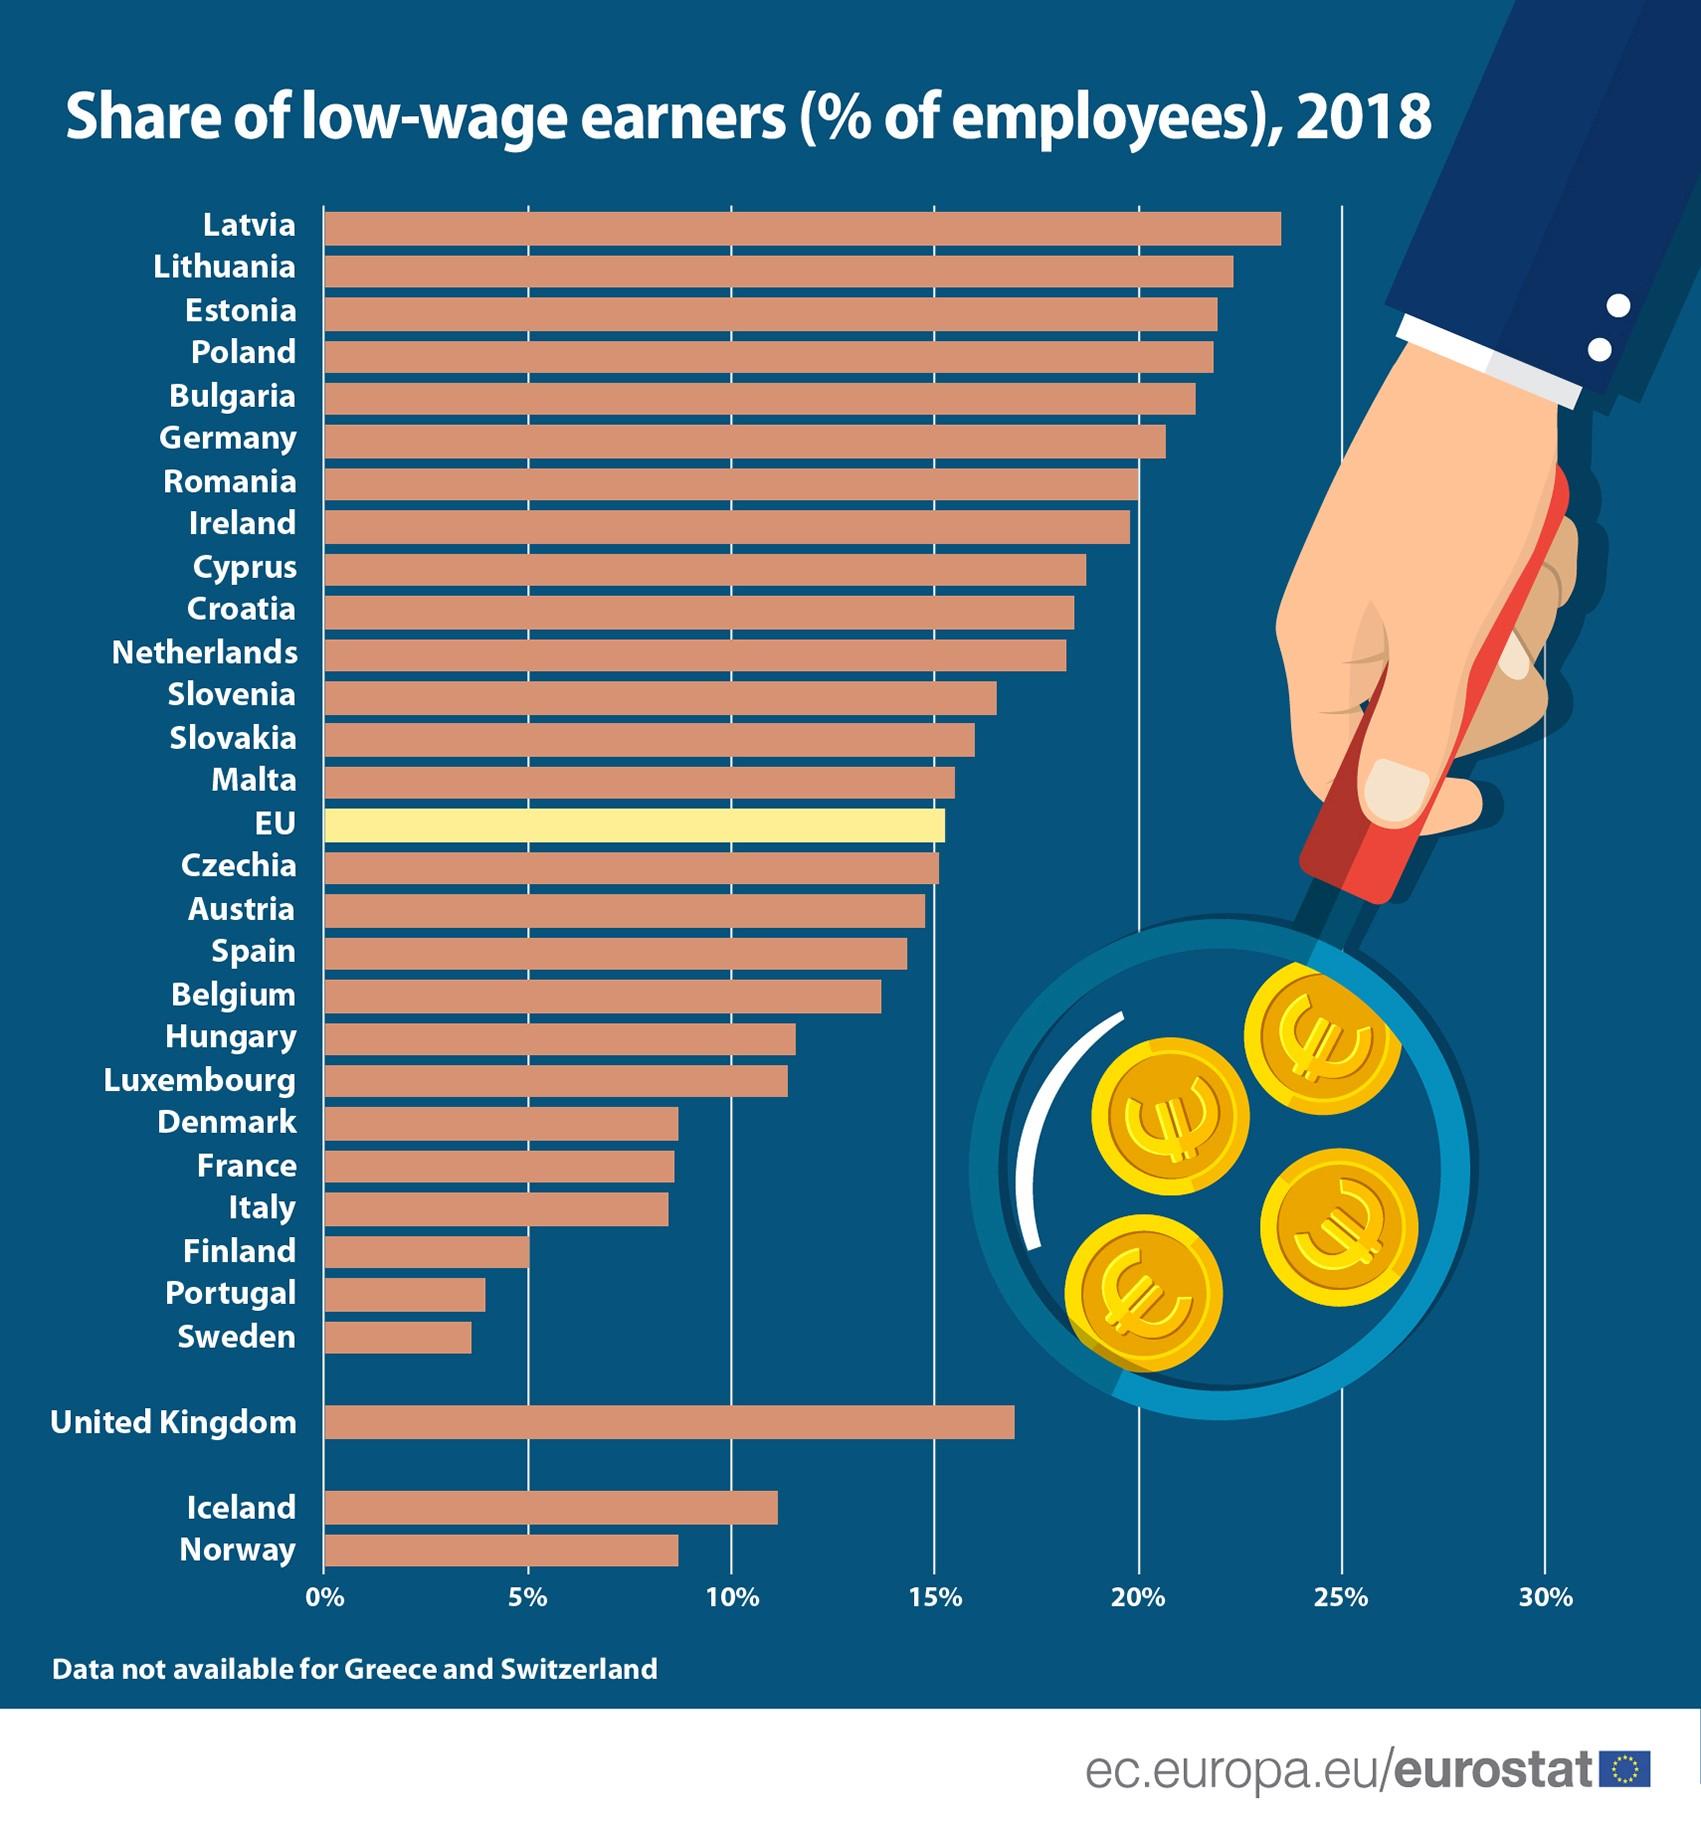 https://ec.europa.eu/eurostat/documents/4187653/10321628/Share+of+low-wage+earners+in+the+EU.jpg